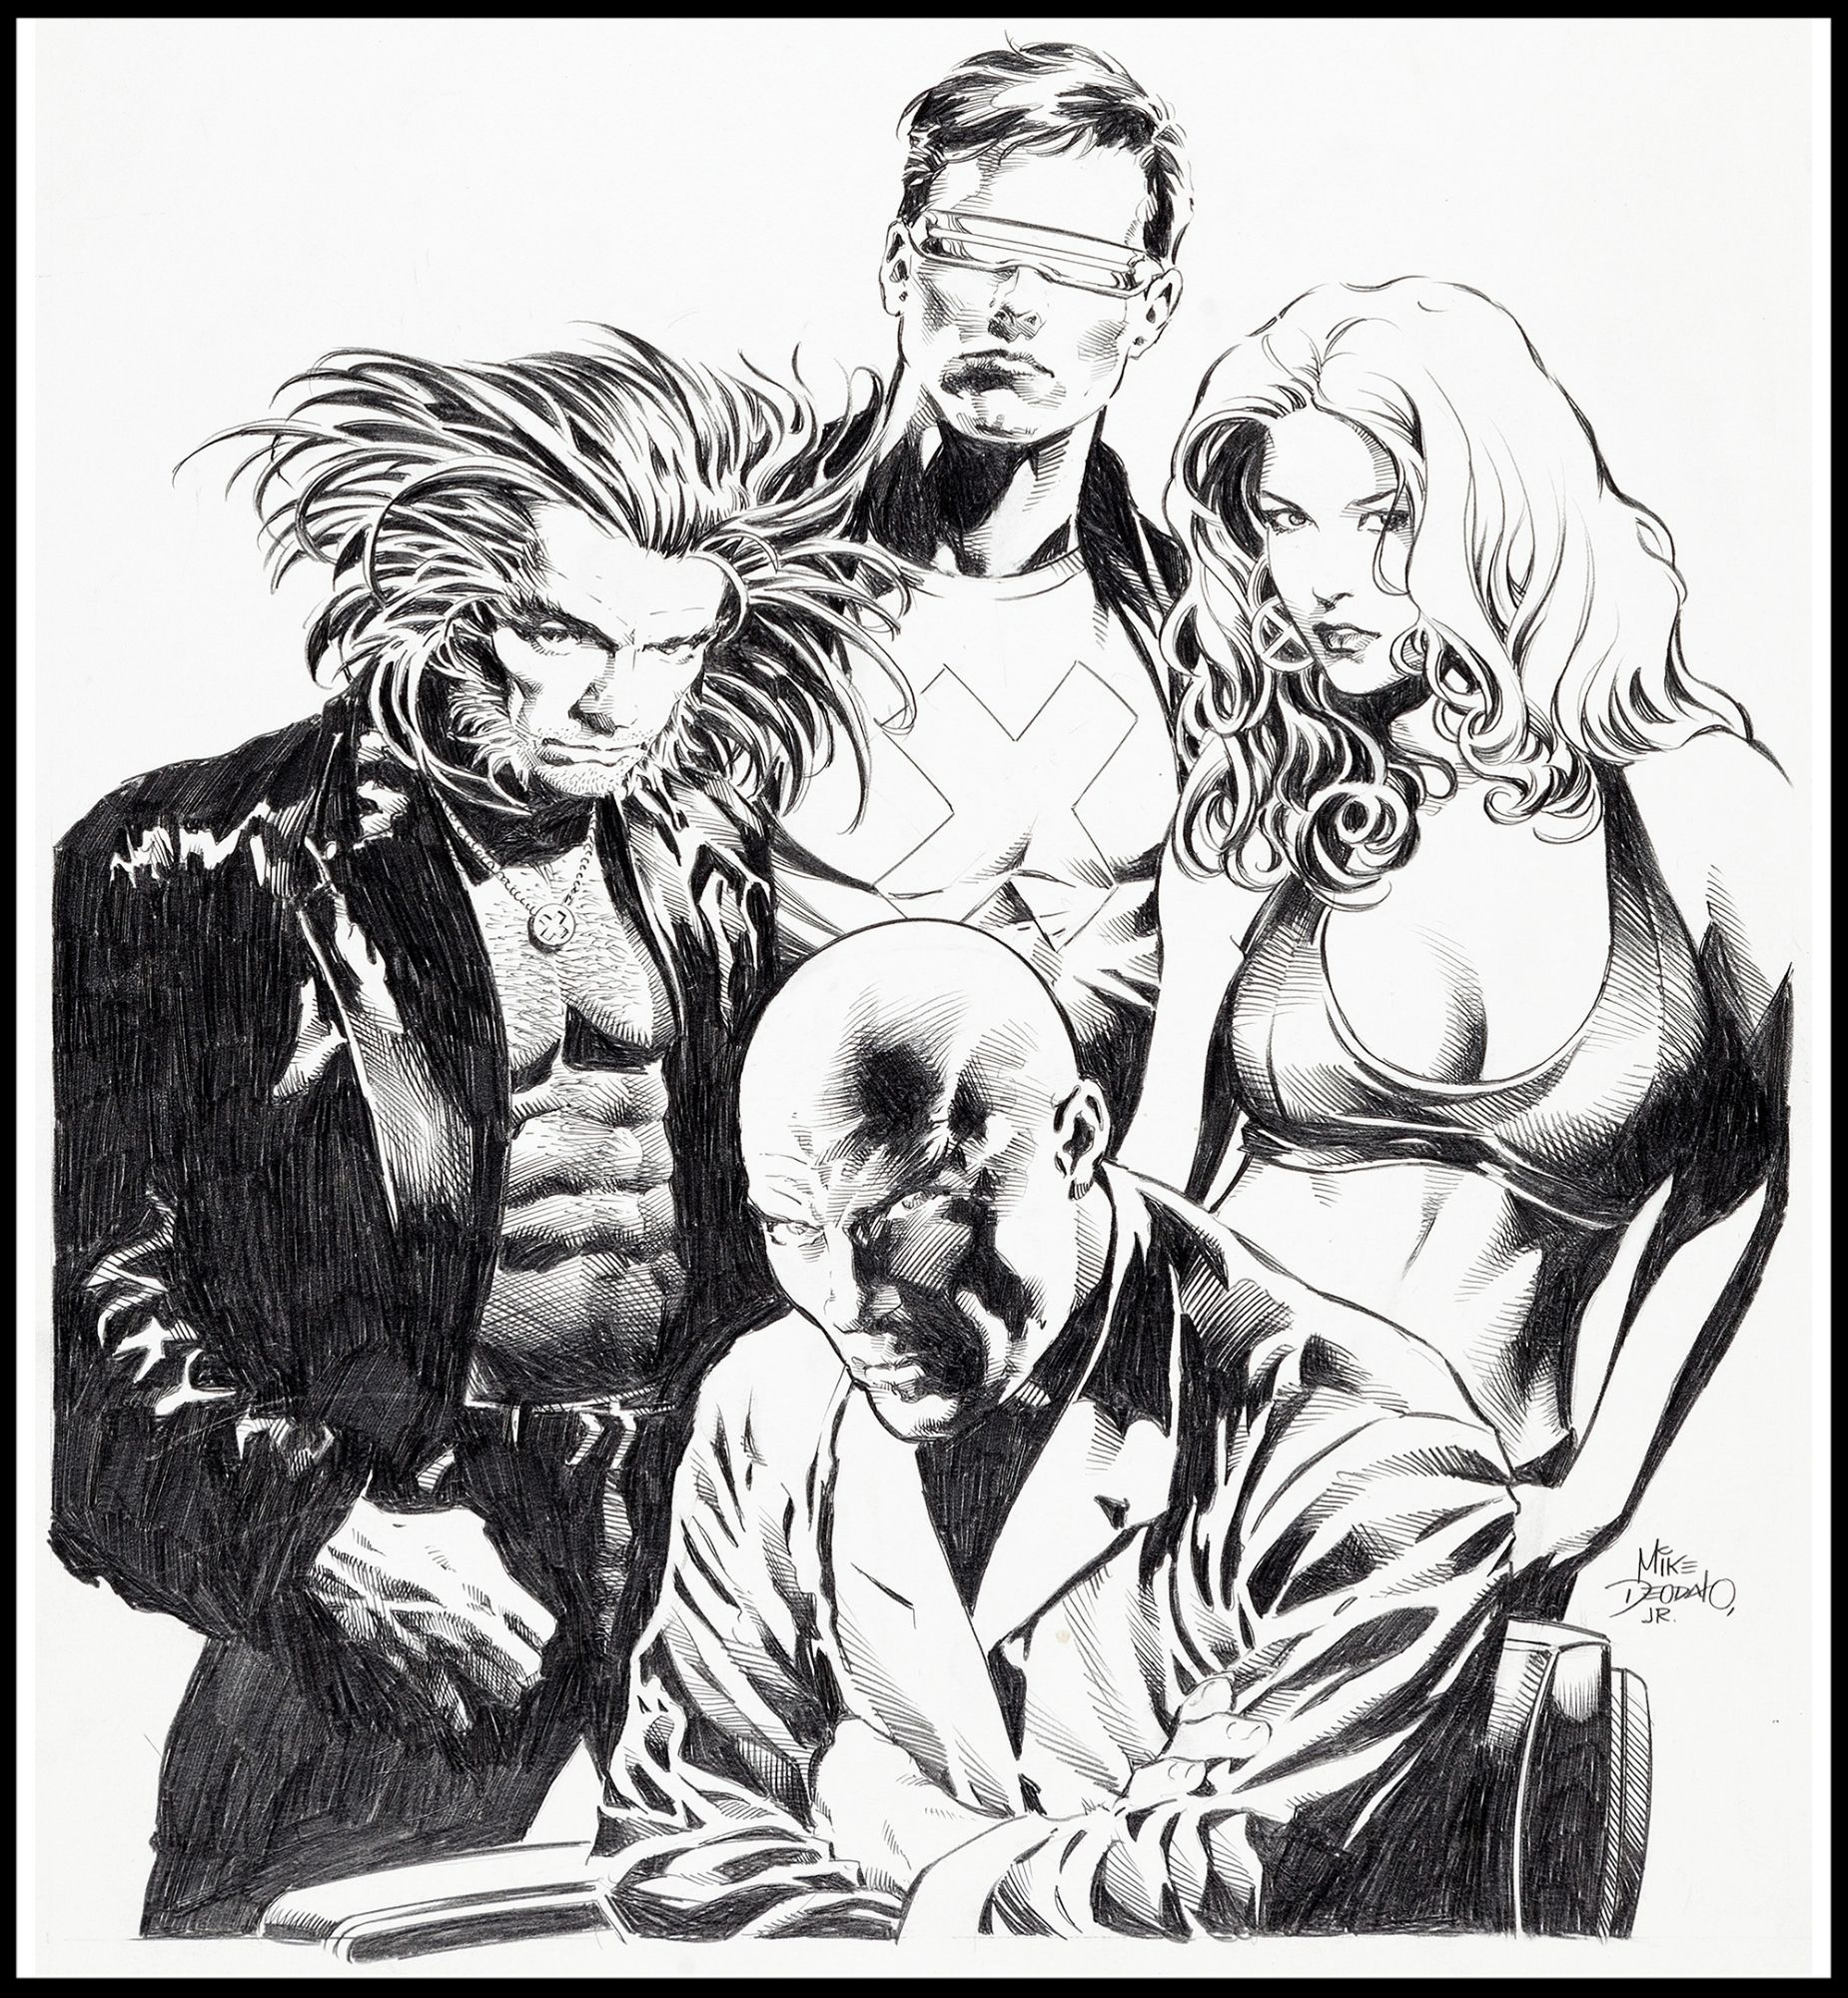 Pin By Derek Anderson On Comic Art Mike Deodato X Men Comics